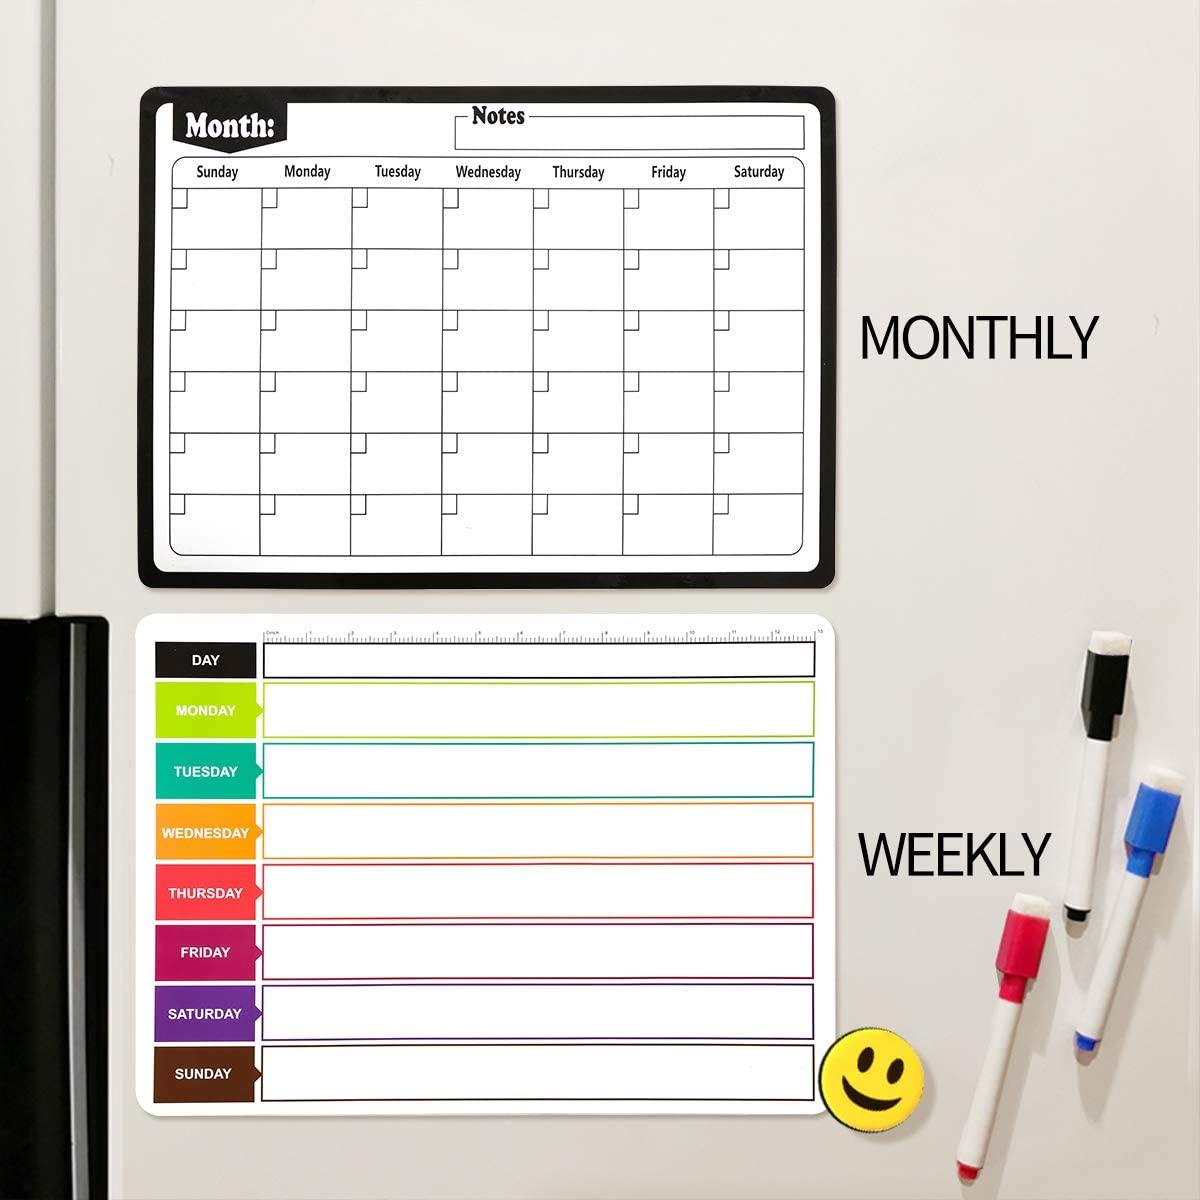 Magnetic Dry-Erase White Board Sheet for Fridge Refrigerator Whiteboard Planner Month Organizer Magnetic Monthly Calendar Board